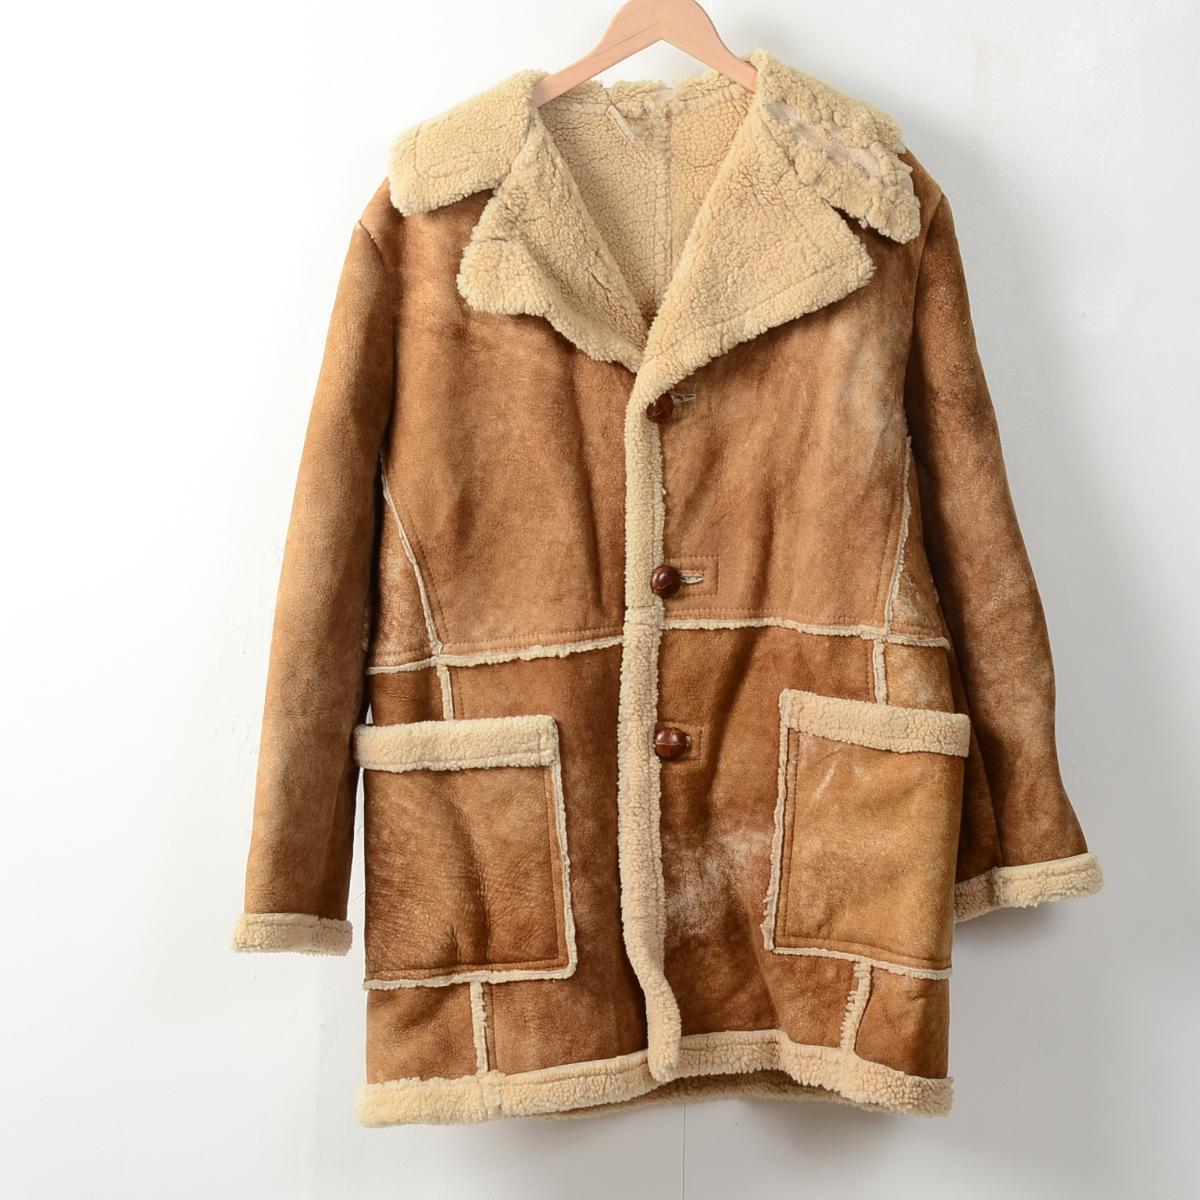 Sheepskin Coat Mens Vintage | Fashion Women's Coat 2017